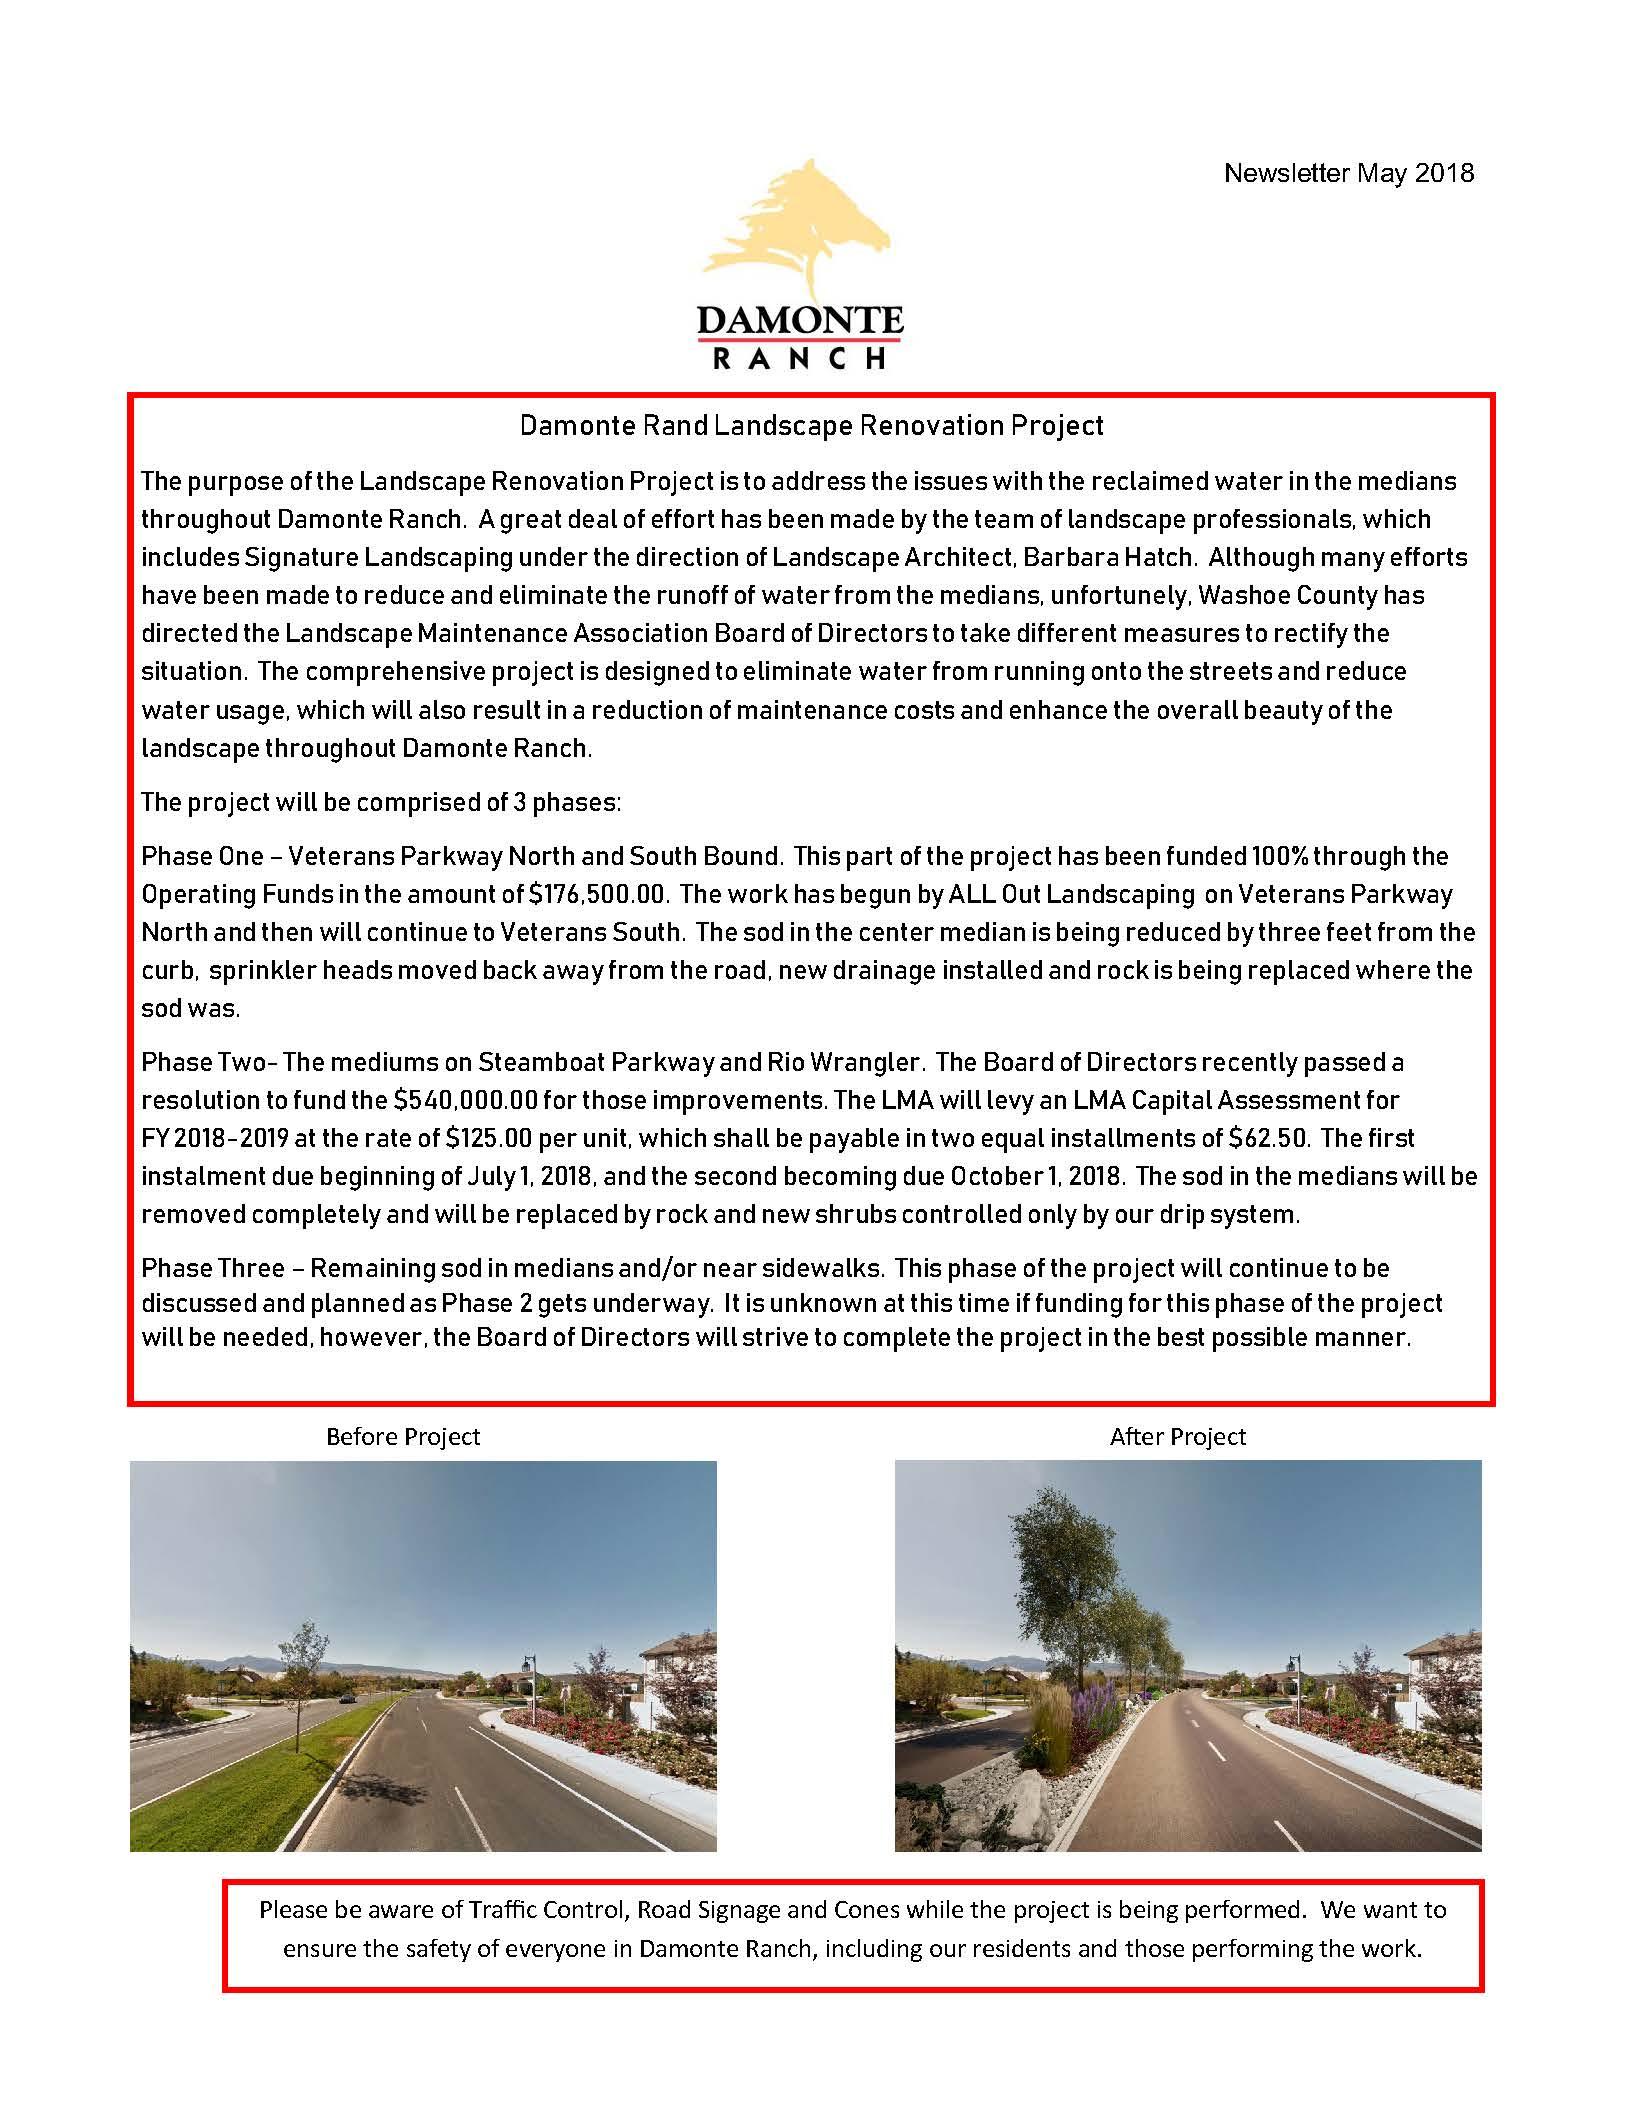 Damonte Ranch Newsletter - May 2018